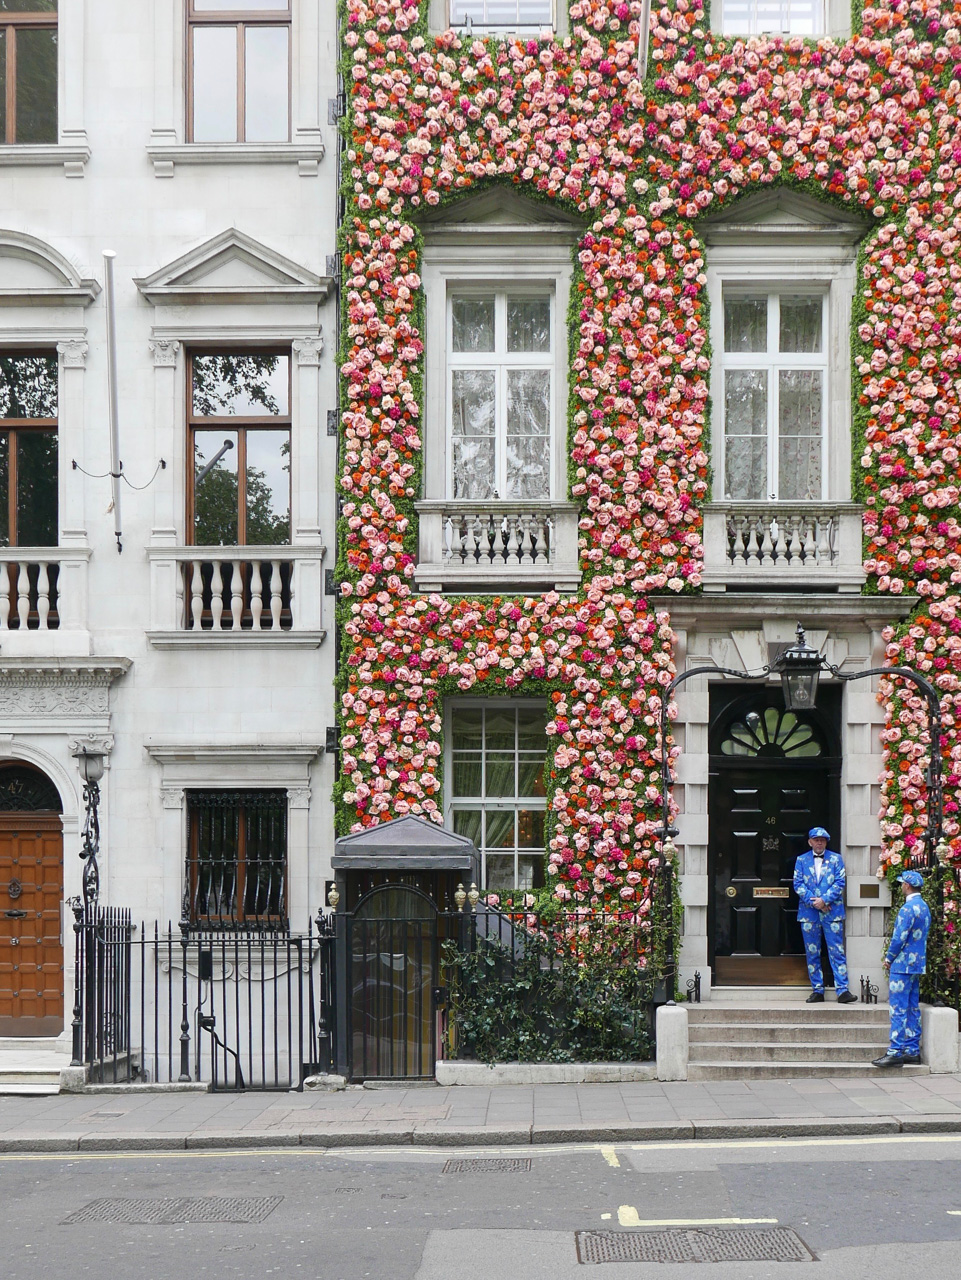 Cara Sharratt Travel - Annabel's in Mayfair - London, England